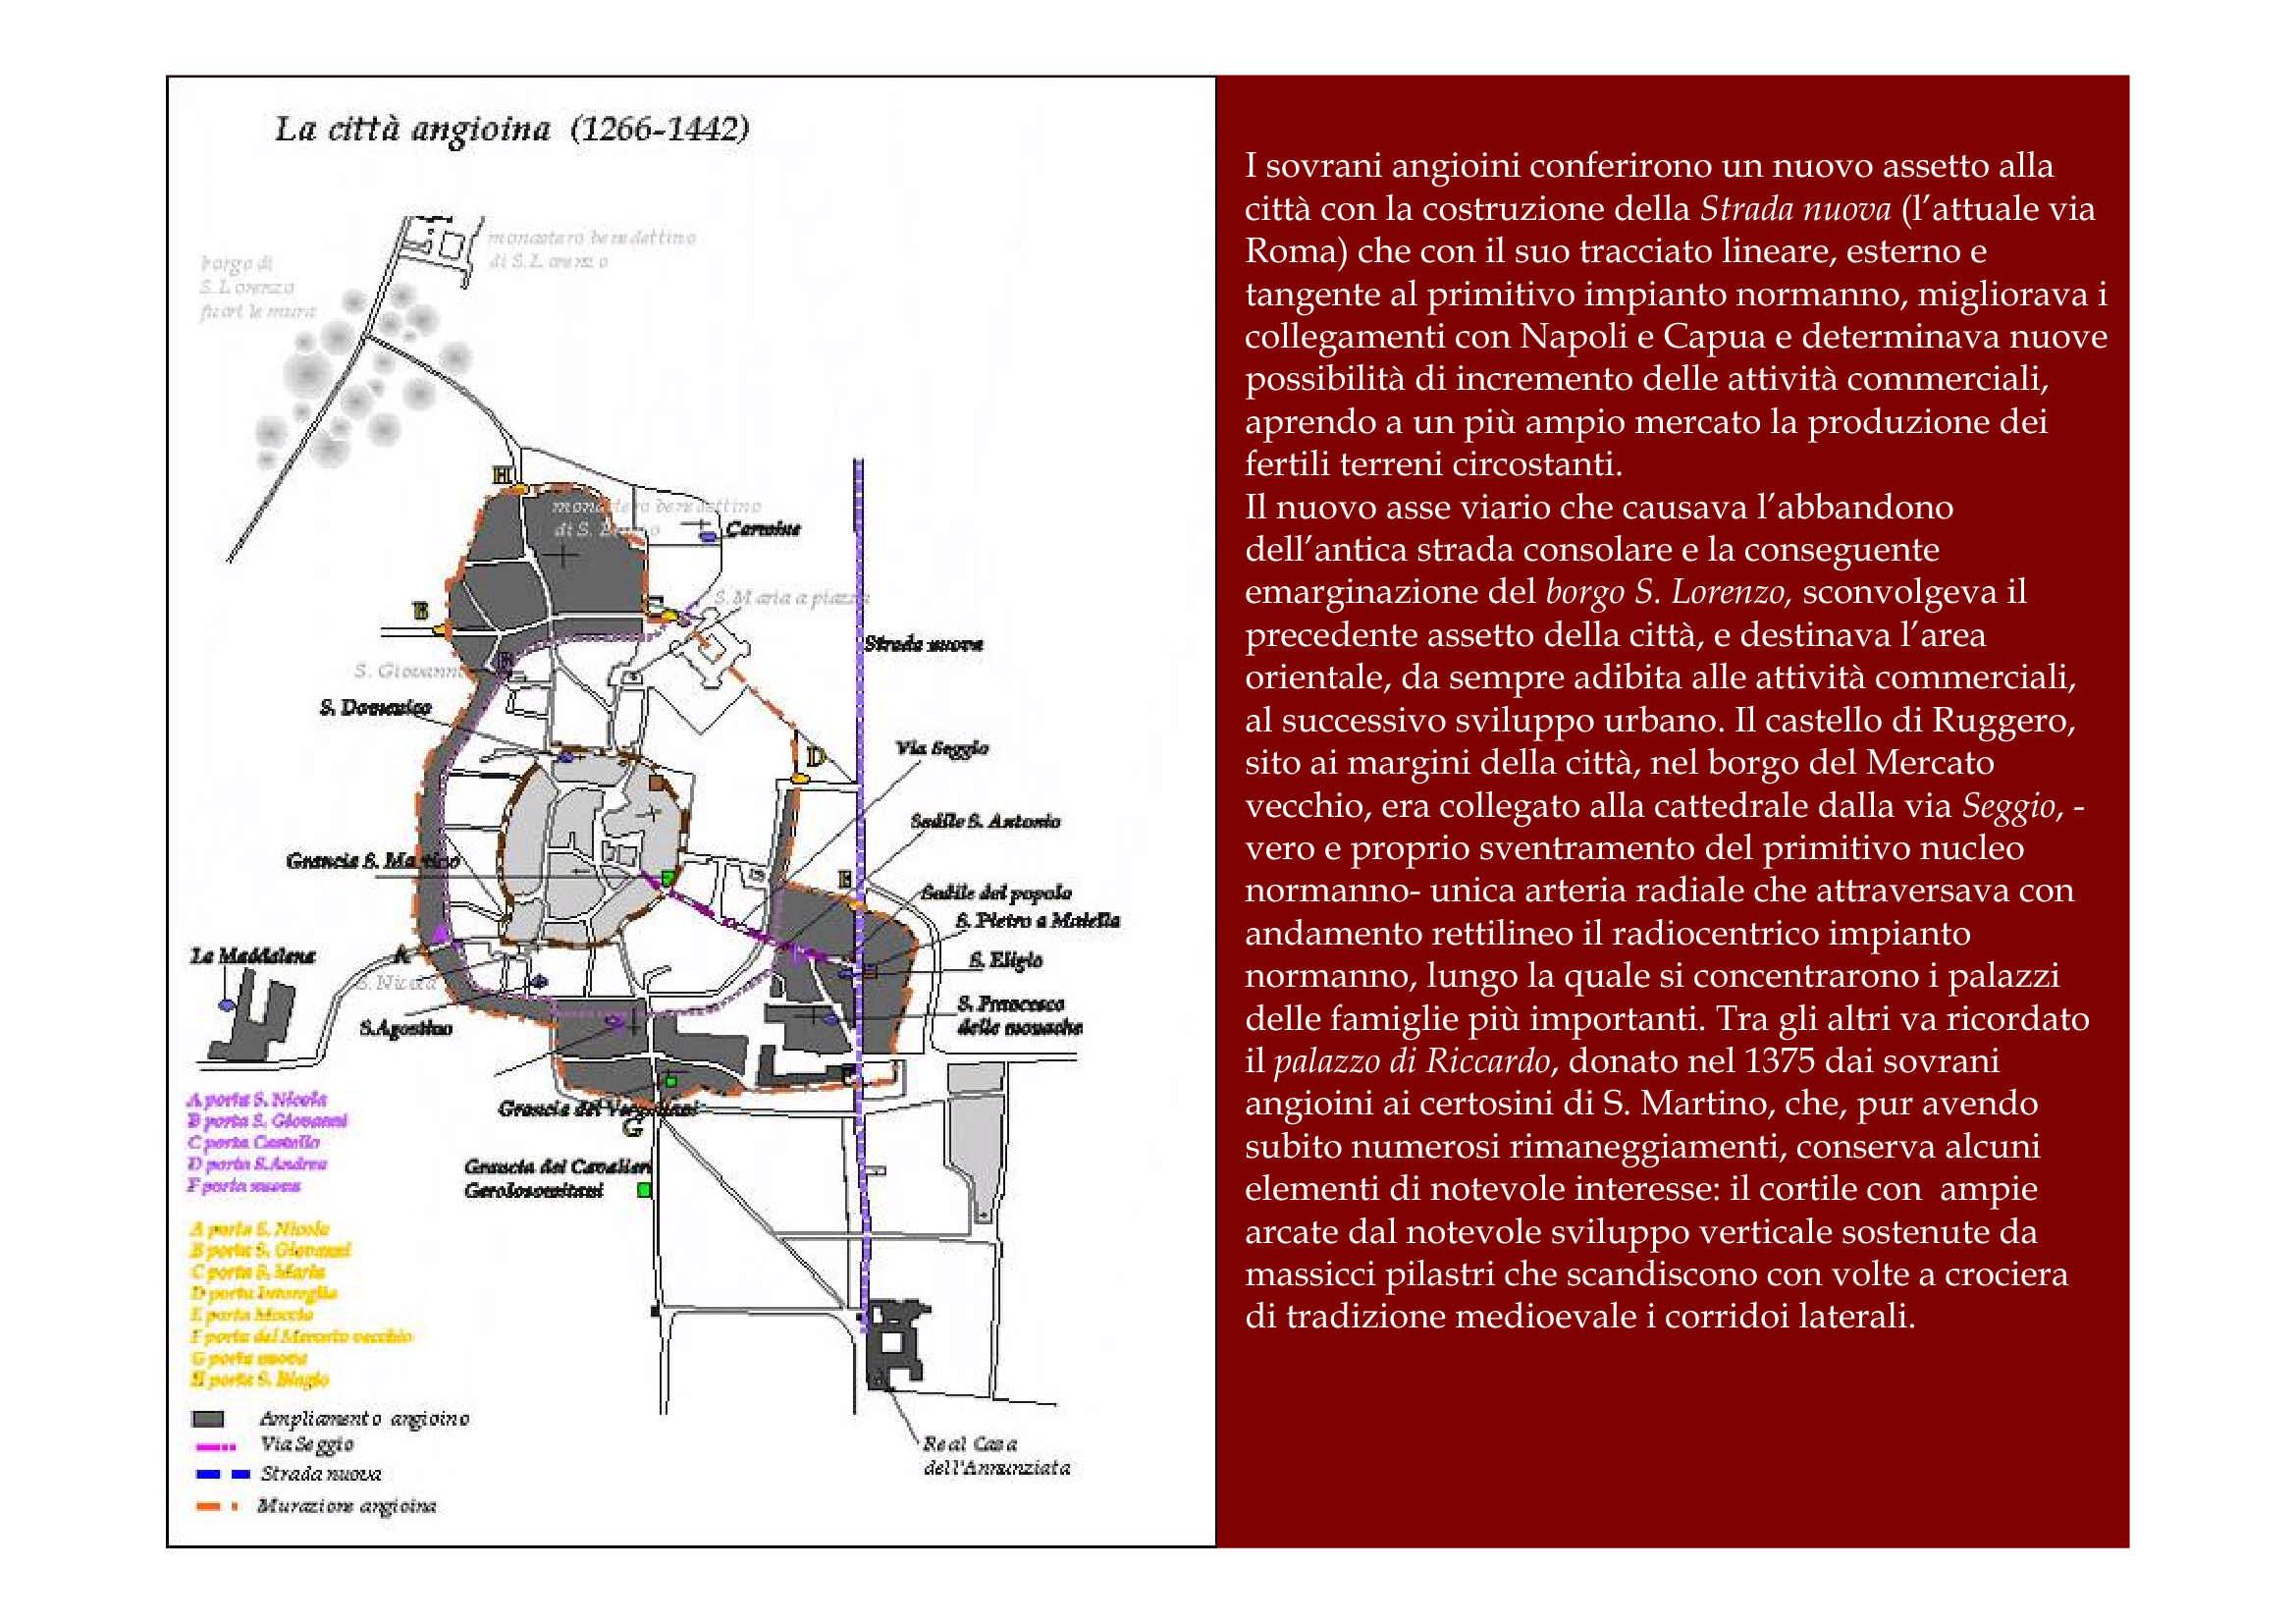 Architettura di Aversa - Angioini